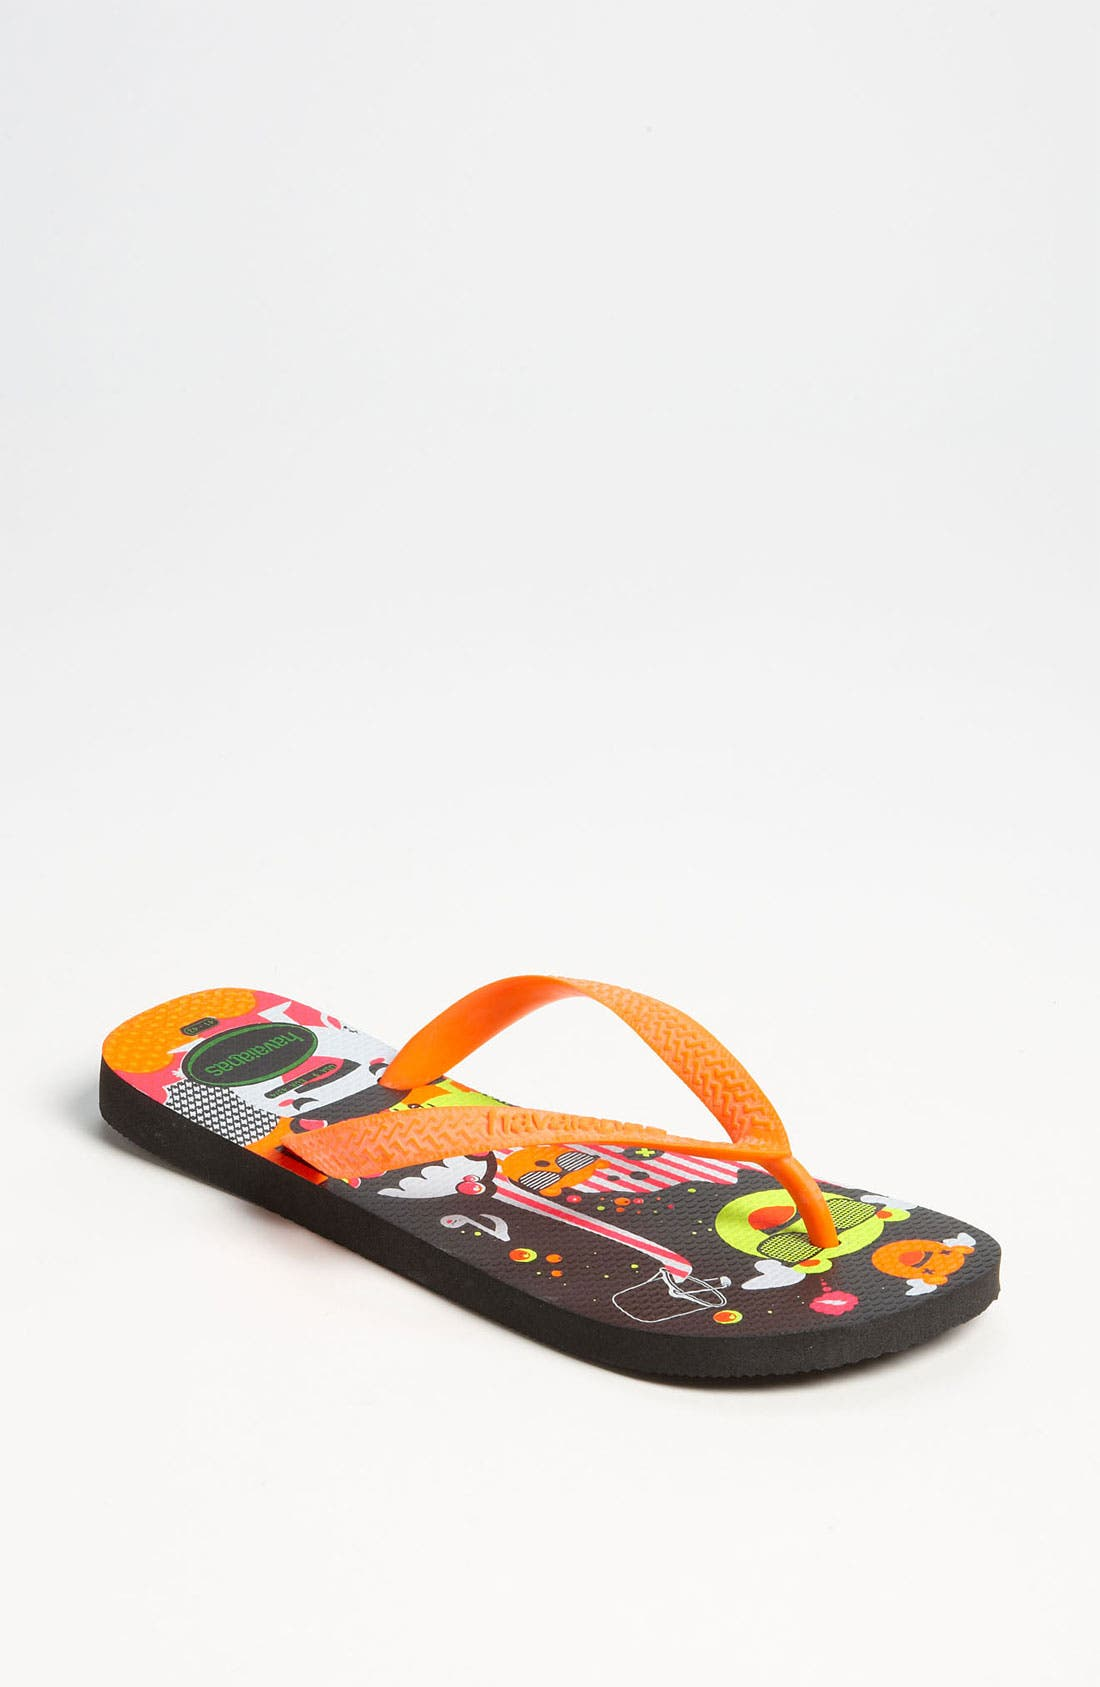 Alternate Image 1 Selected - Havaianas 'Fun' Flip Flop (Women)